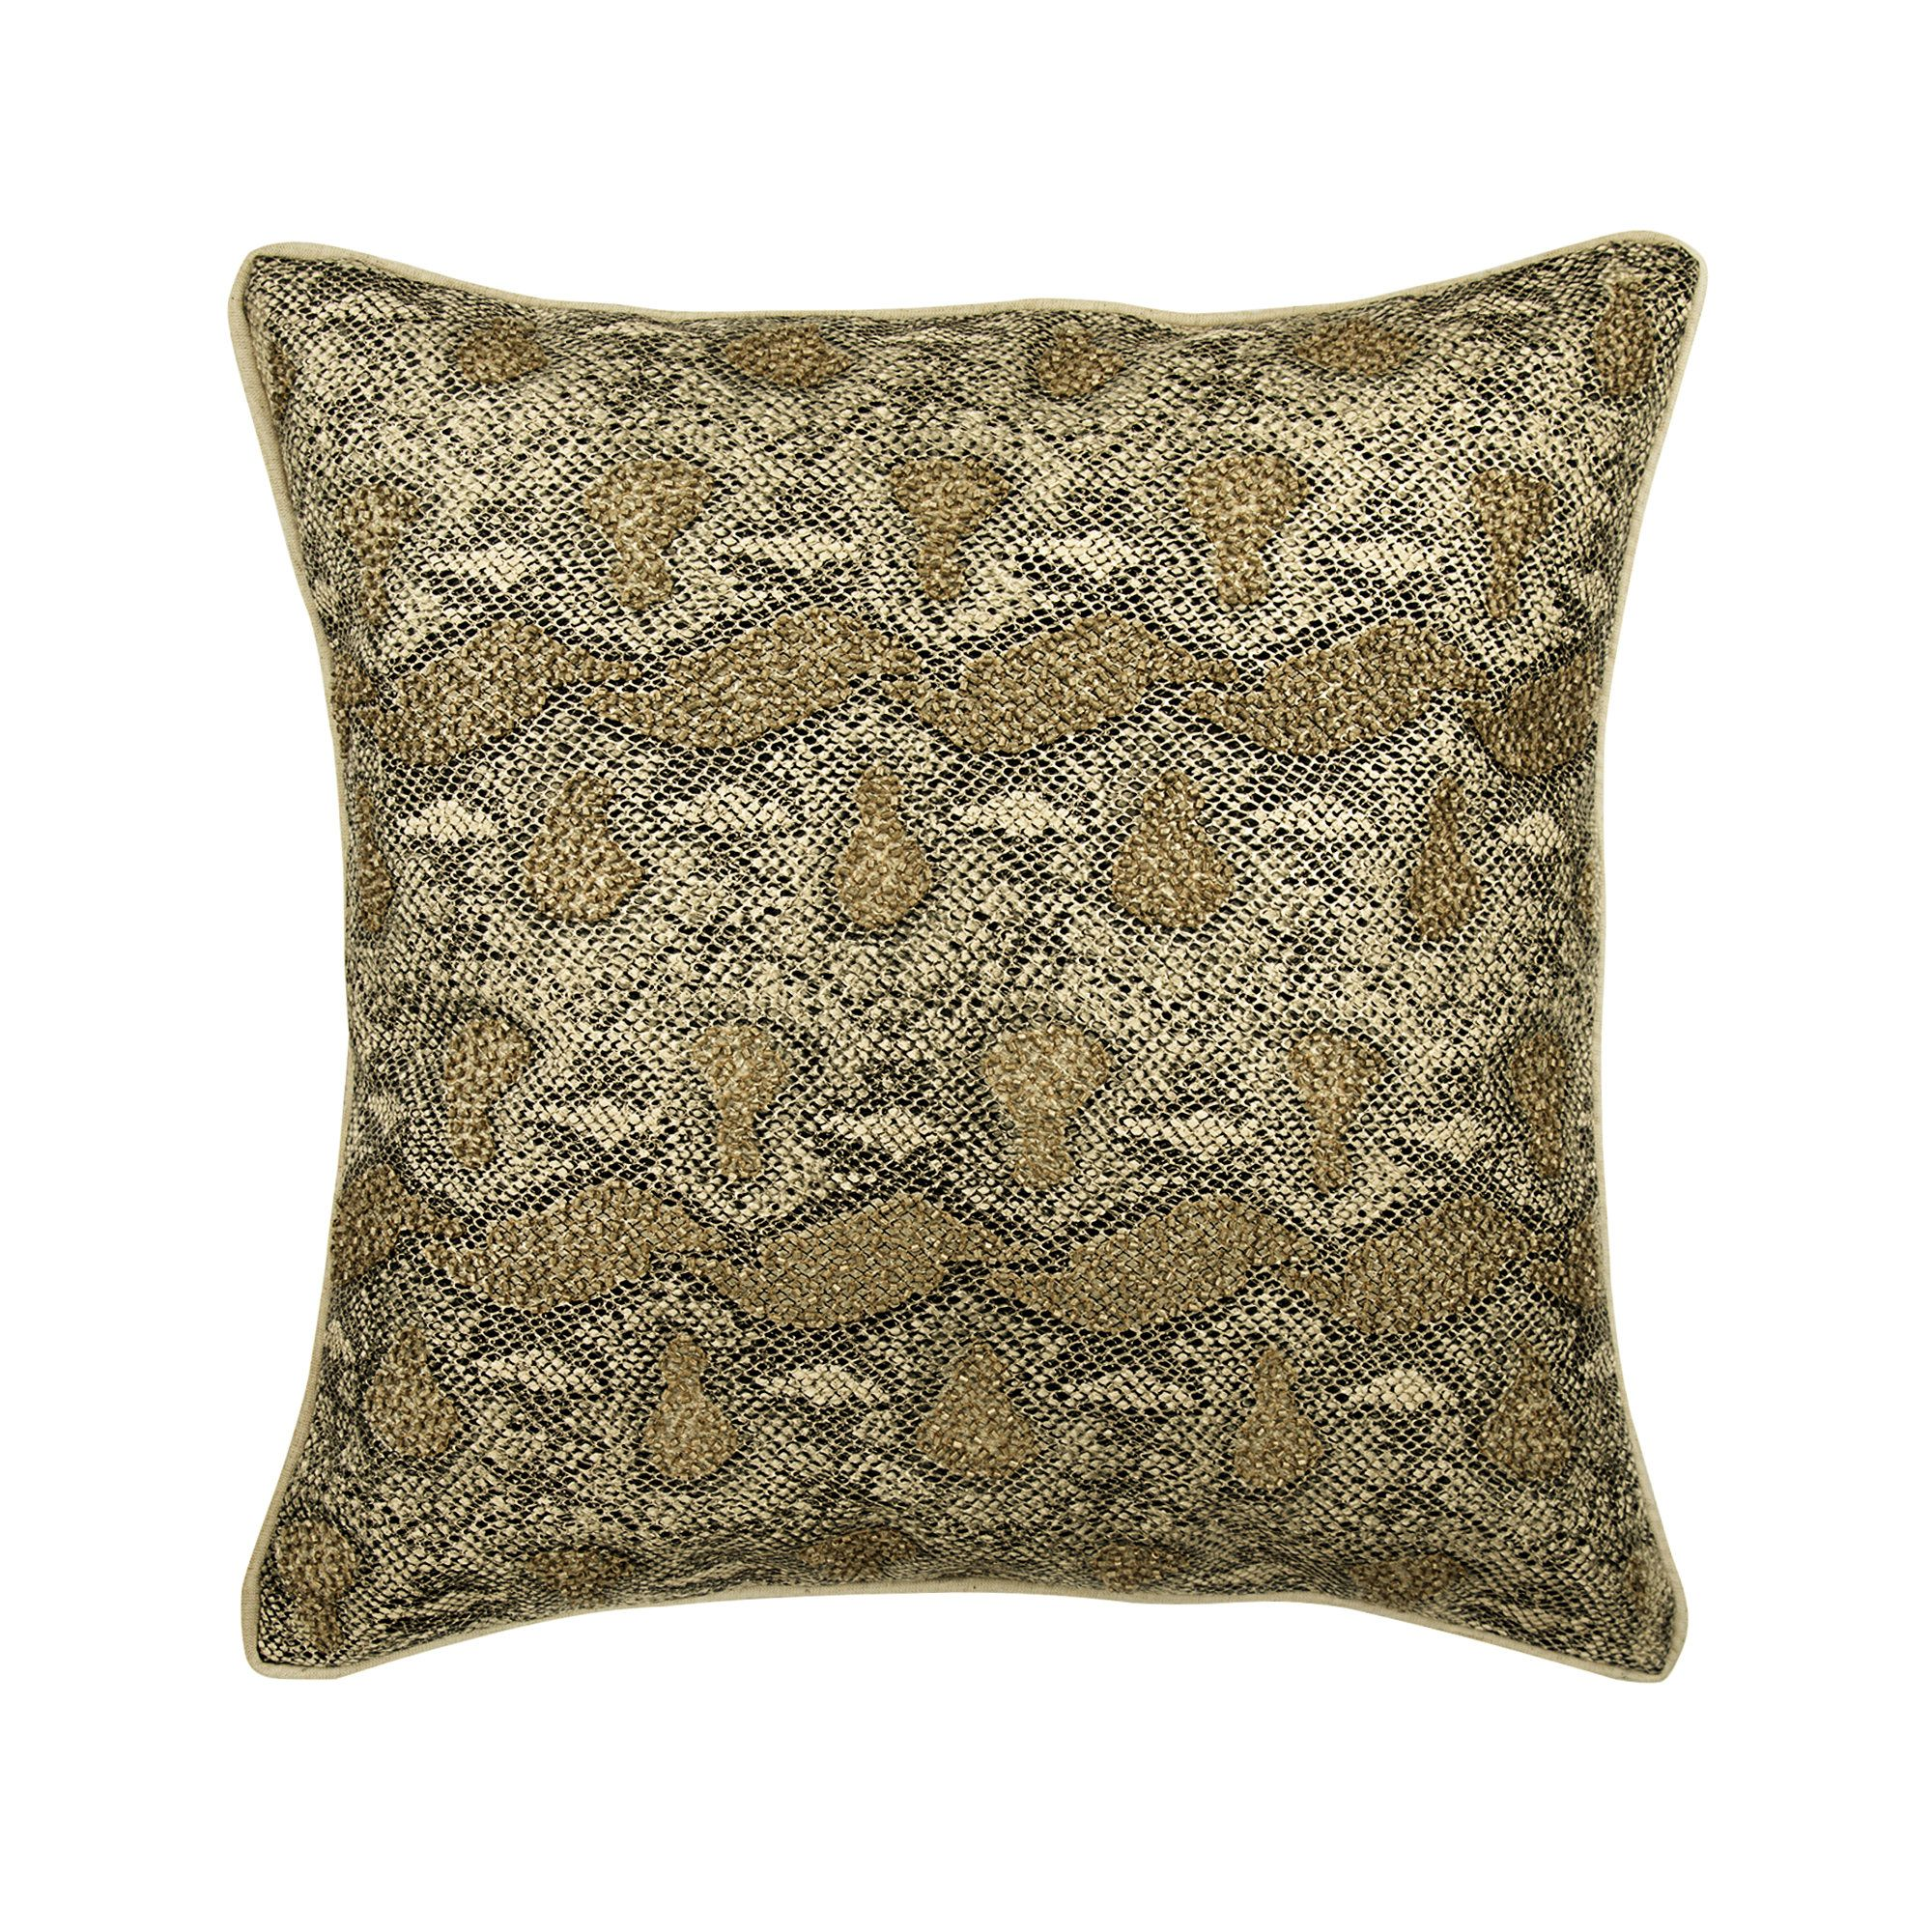 Designer Gold Throw Pillow Custom 16 X16 Leather Suede Sofa